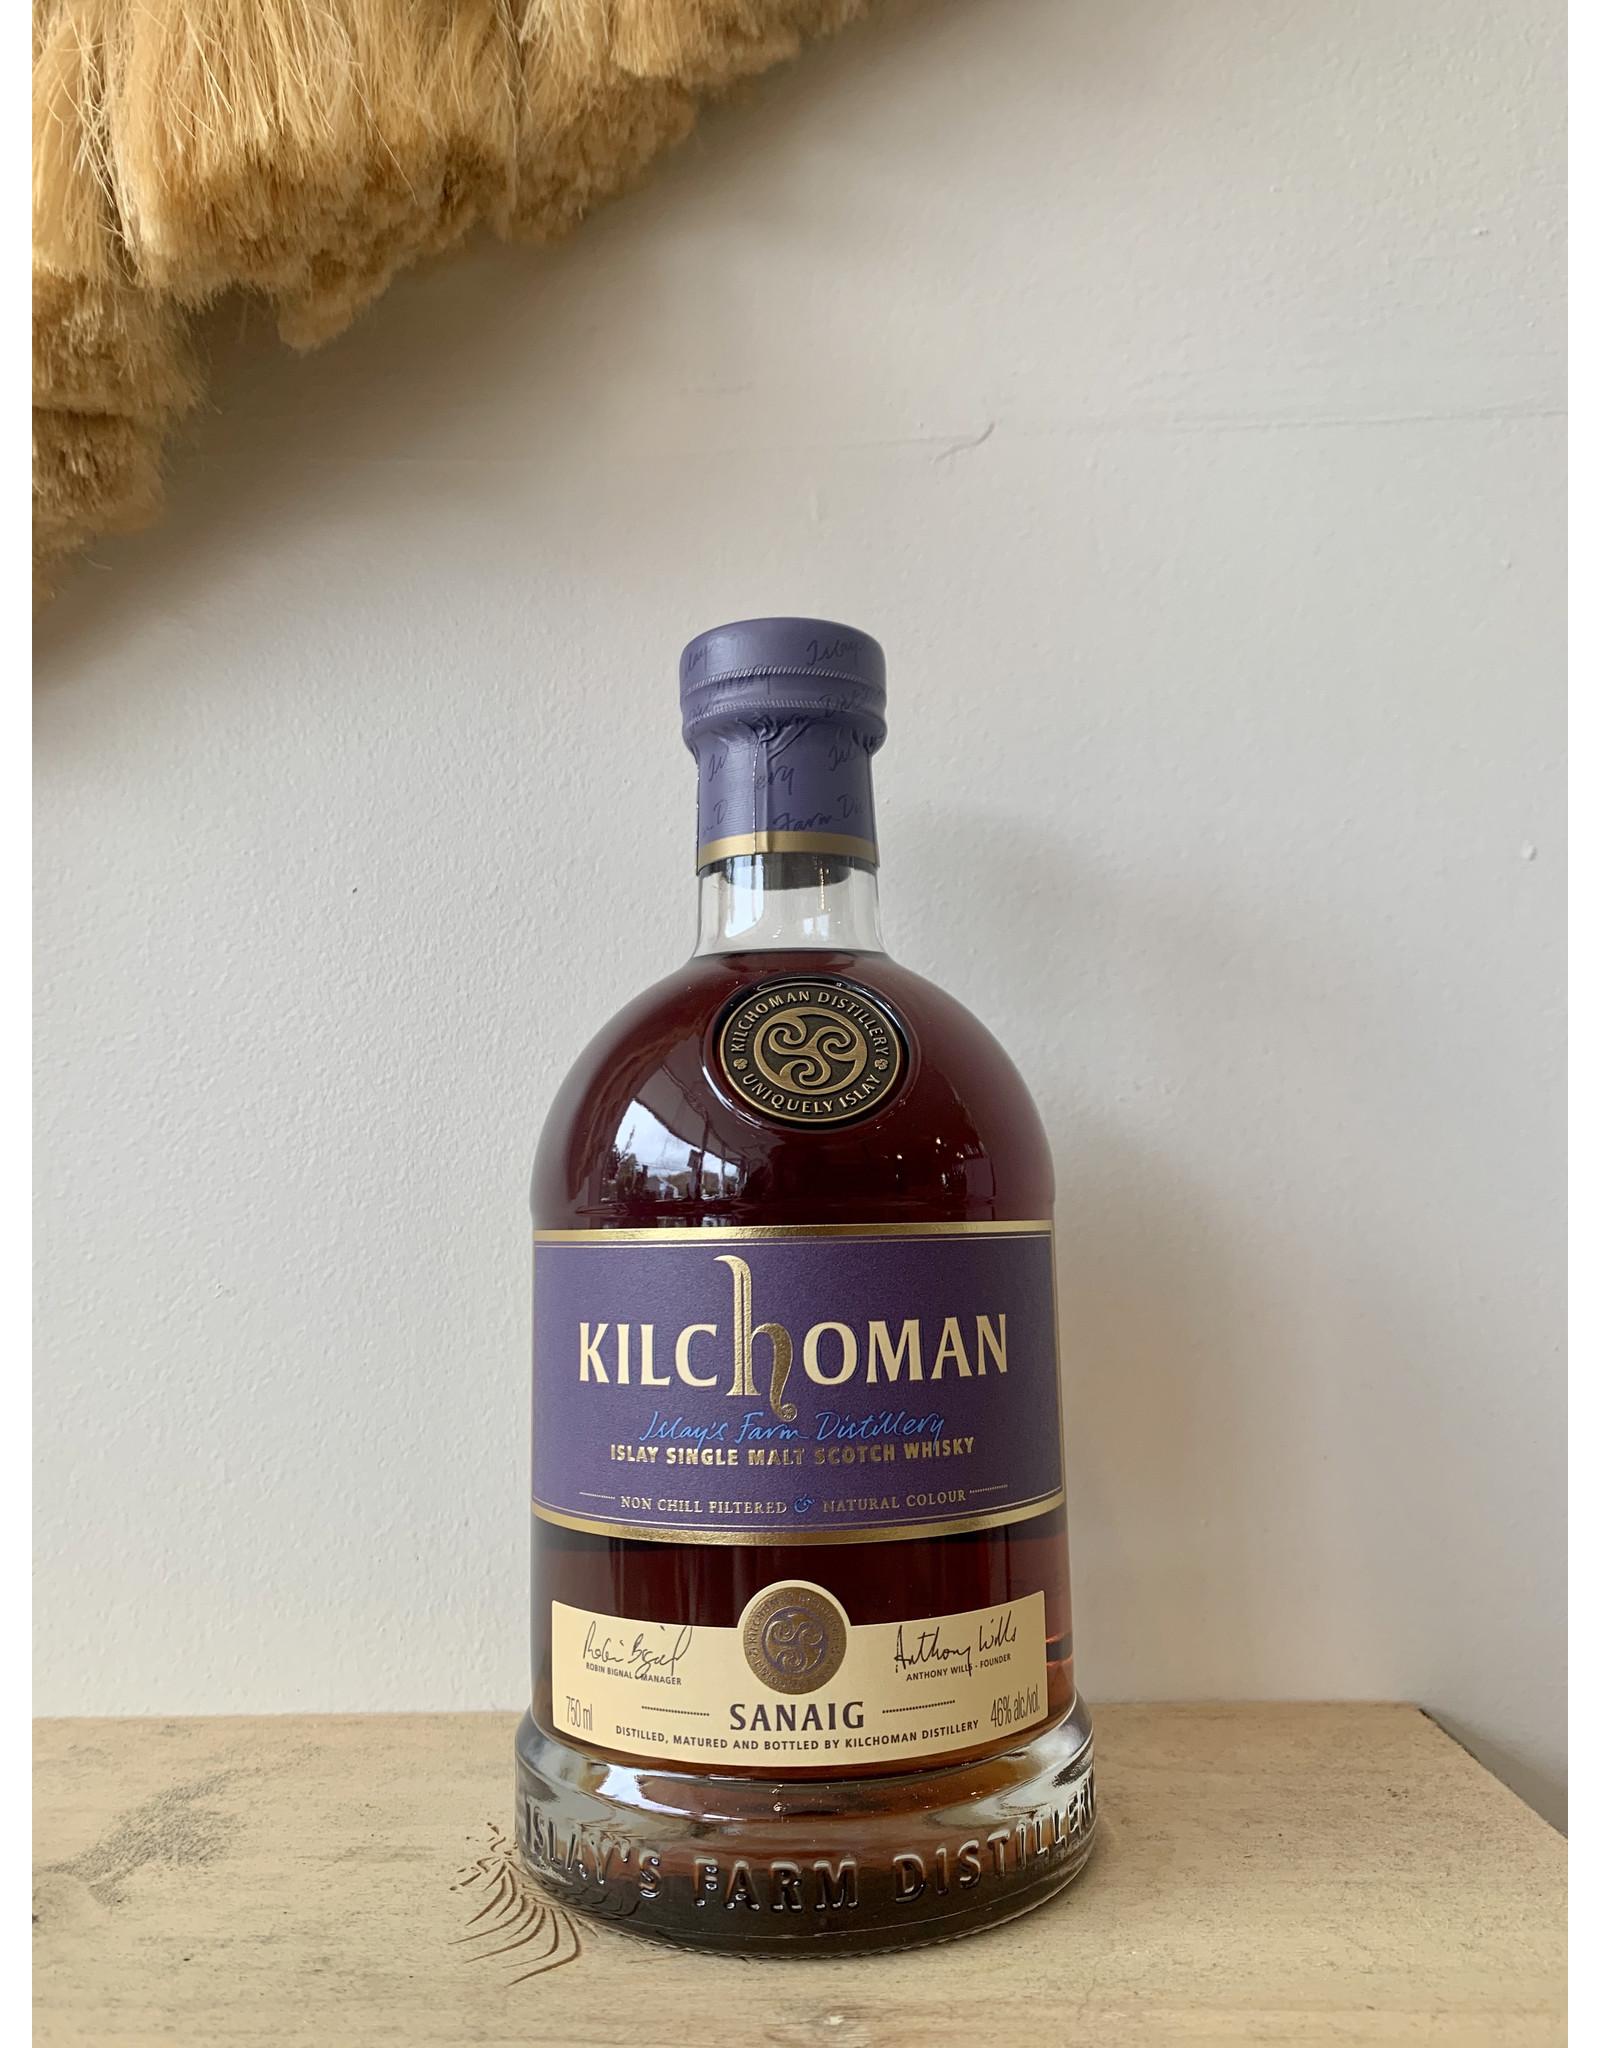 Kilchoman Sanaig Islay Single Malt Scotch Whisky